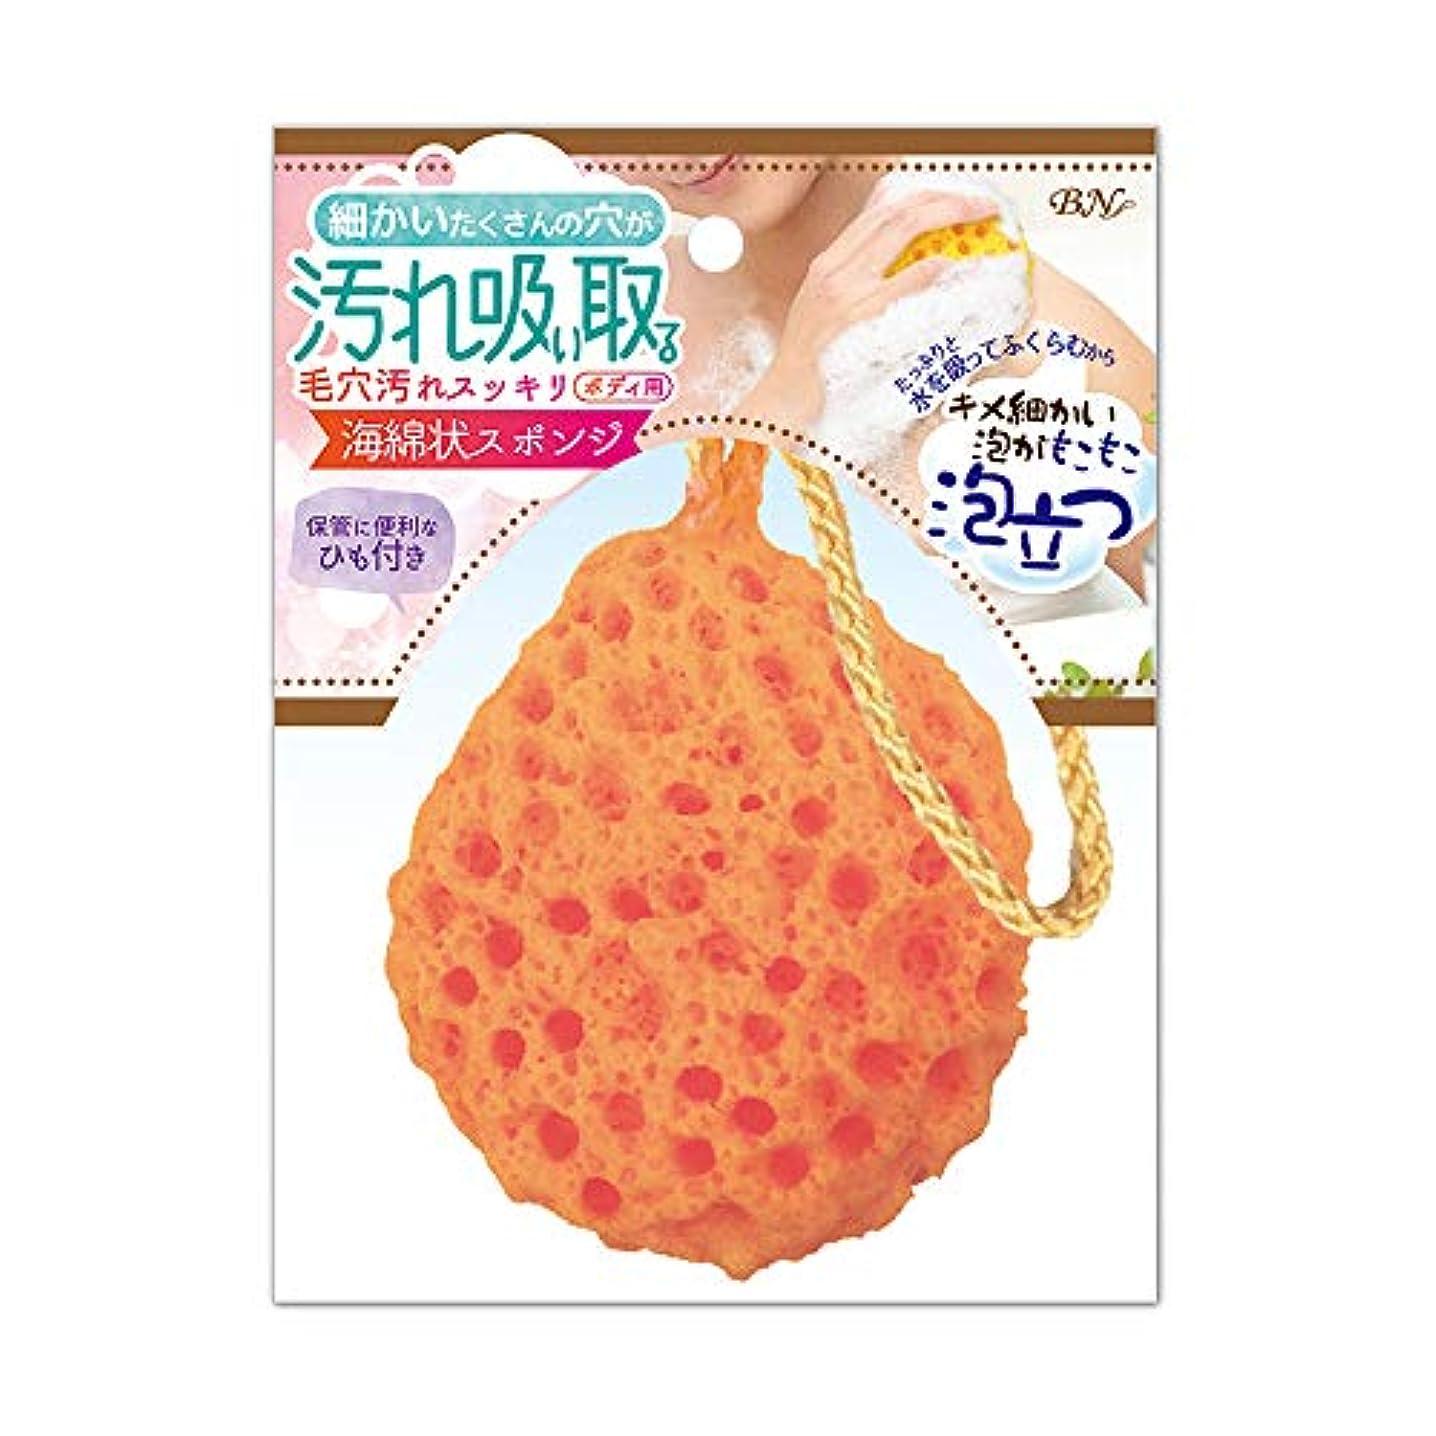 BN 海綿状スポンジ KAM-02 オレンジ (1個)